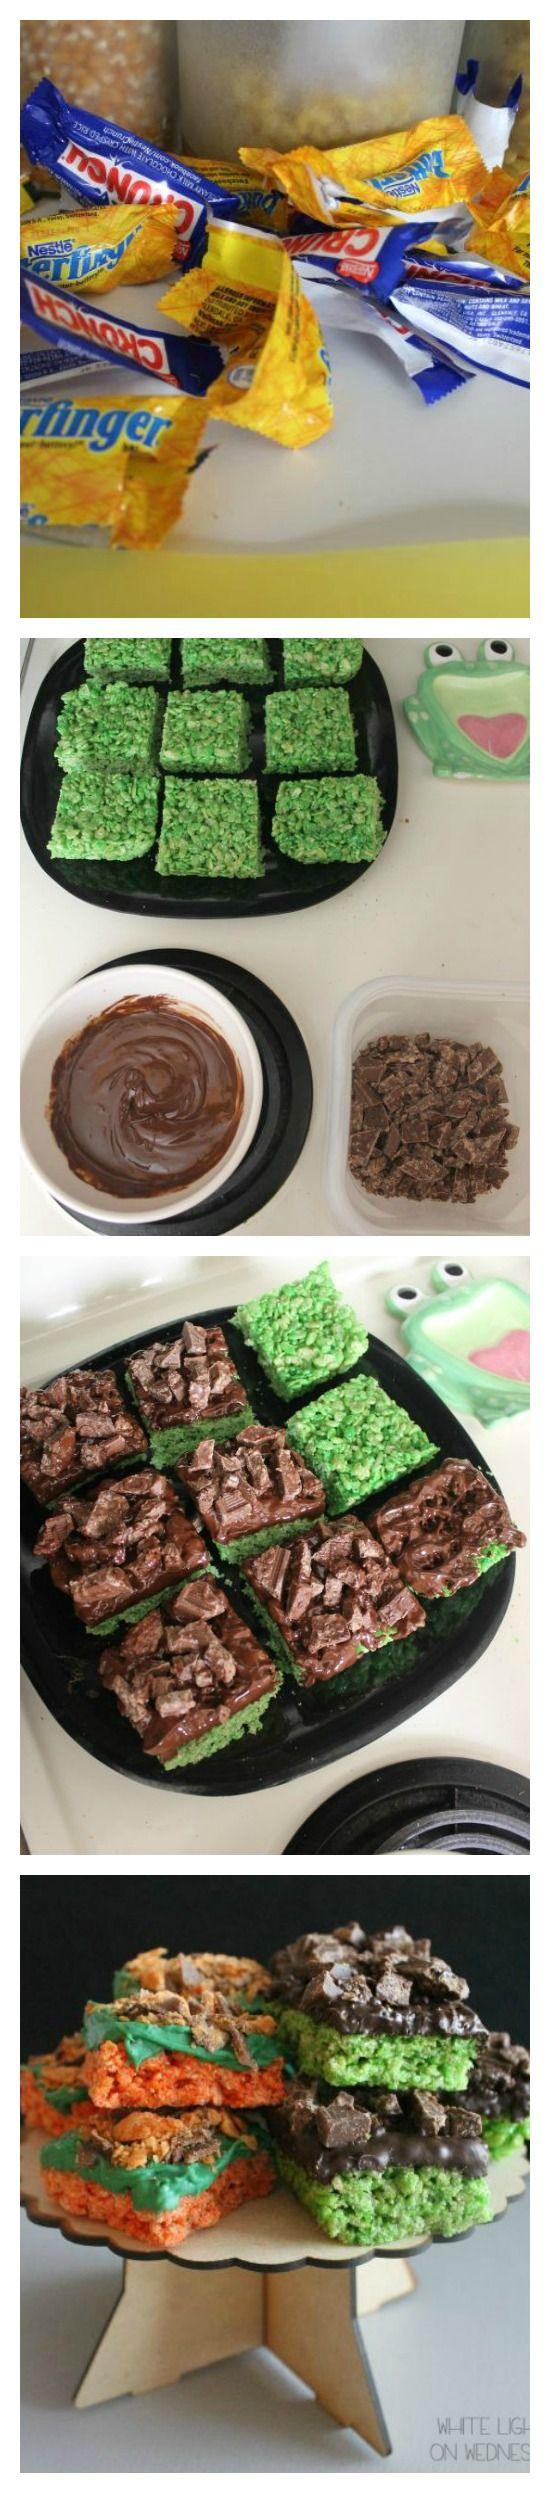 Steps to Make Your Own Frankenstein & Pumpkin Rice Cereal Halloween Treats